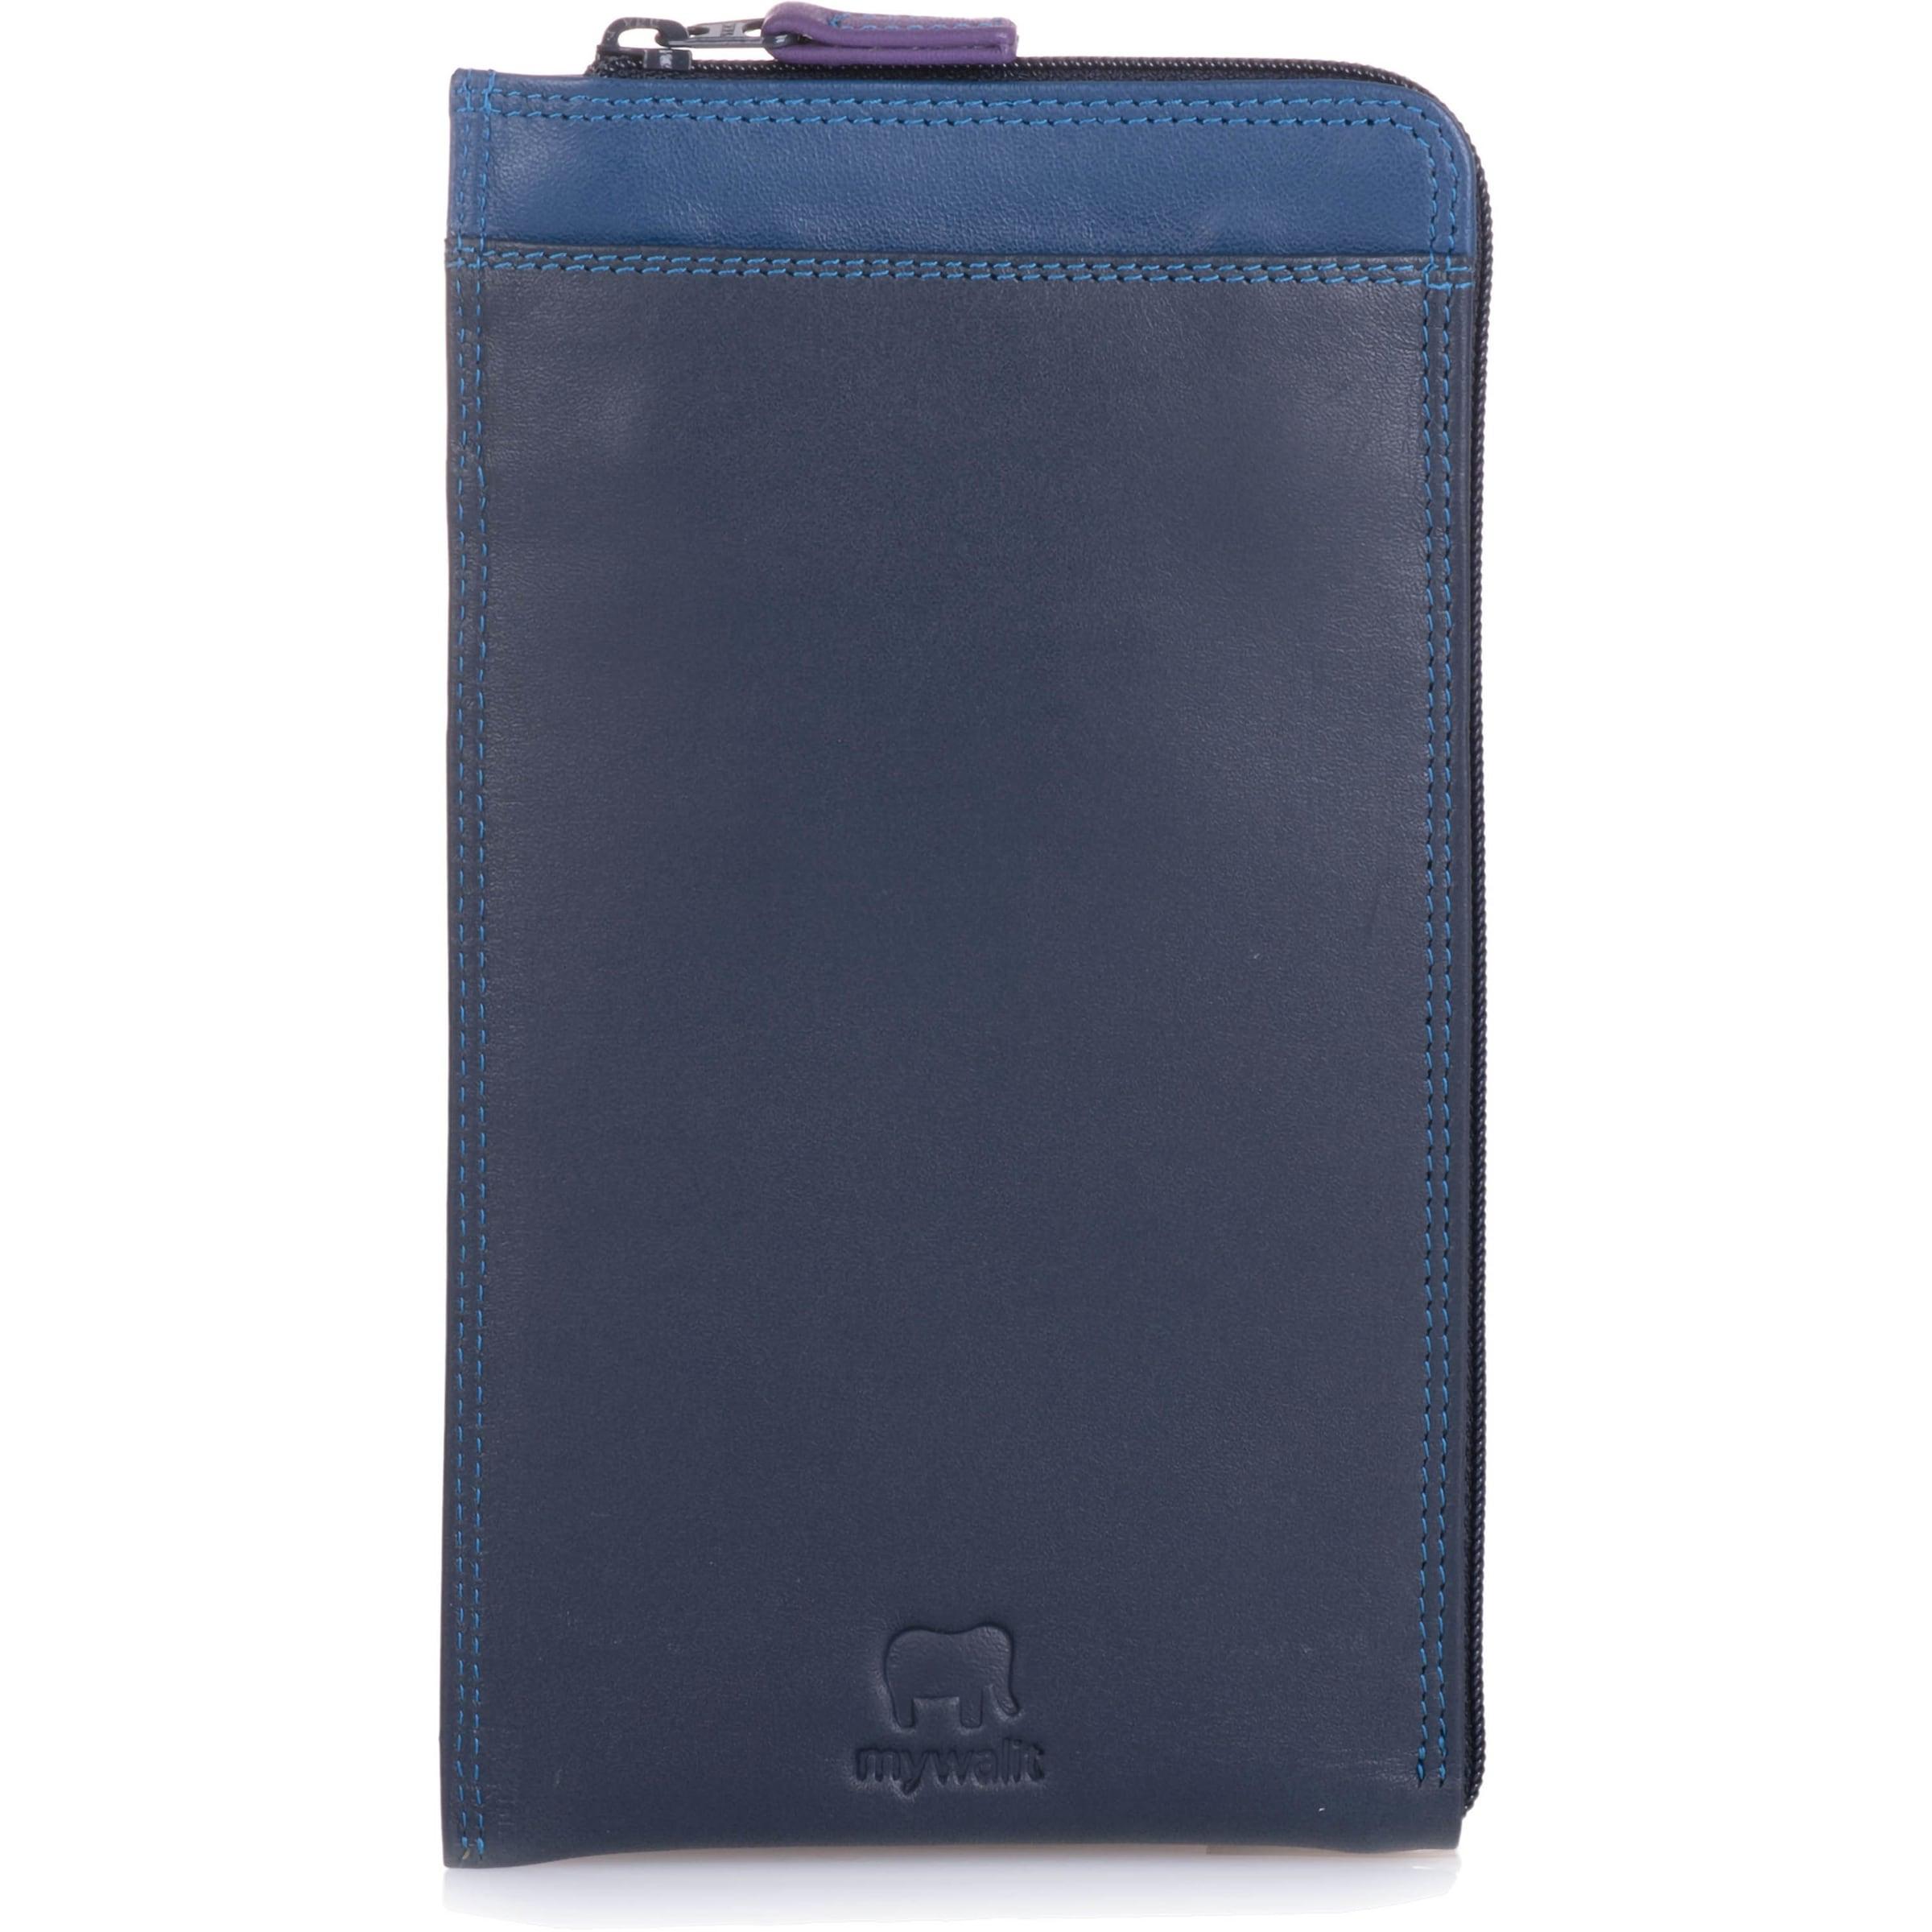 mywalit Geldbörse in blau / marine / violettblau / dunkellila